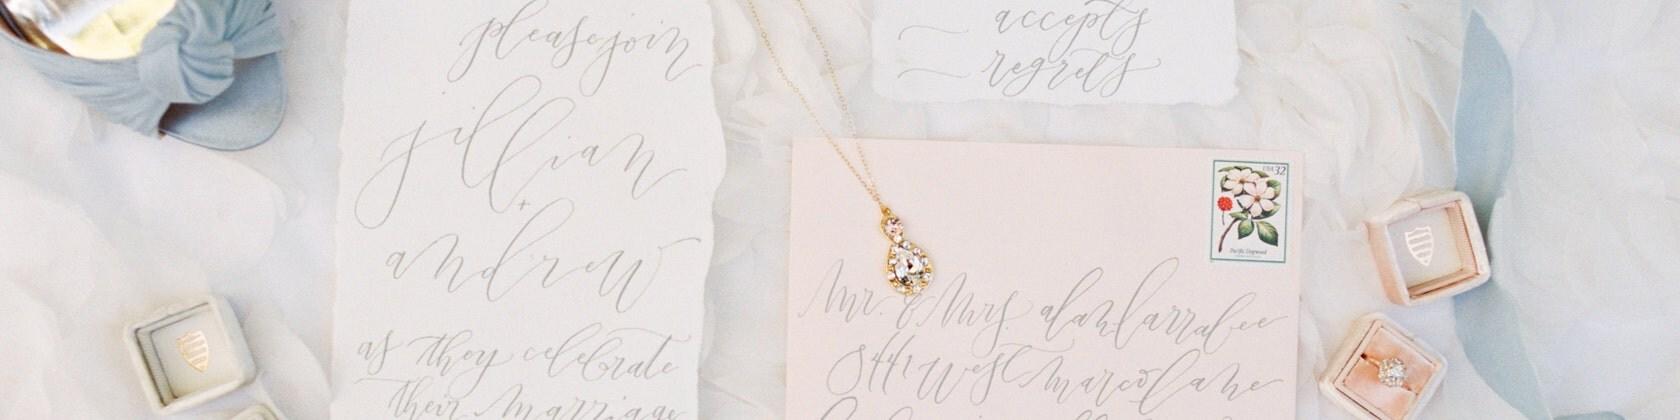 Bespoke Wedding Invitations Calligraphy By Dovehousehandmade